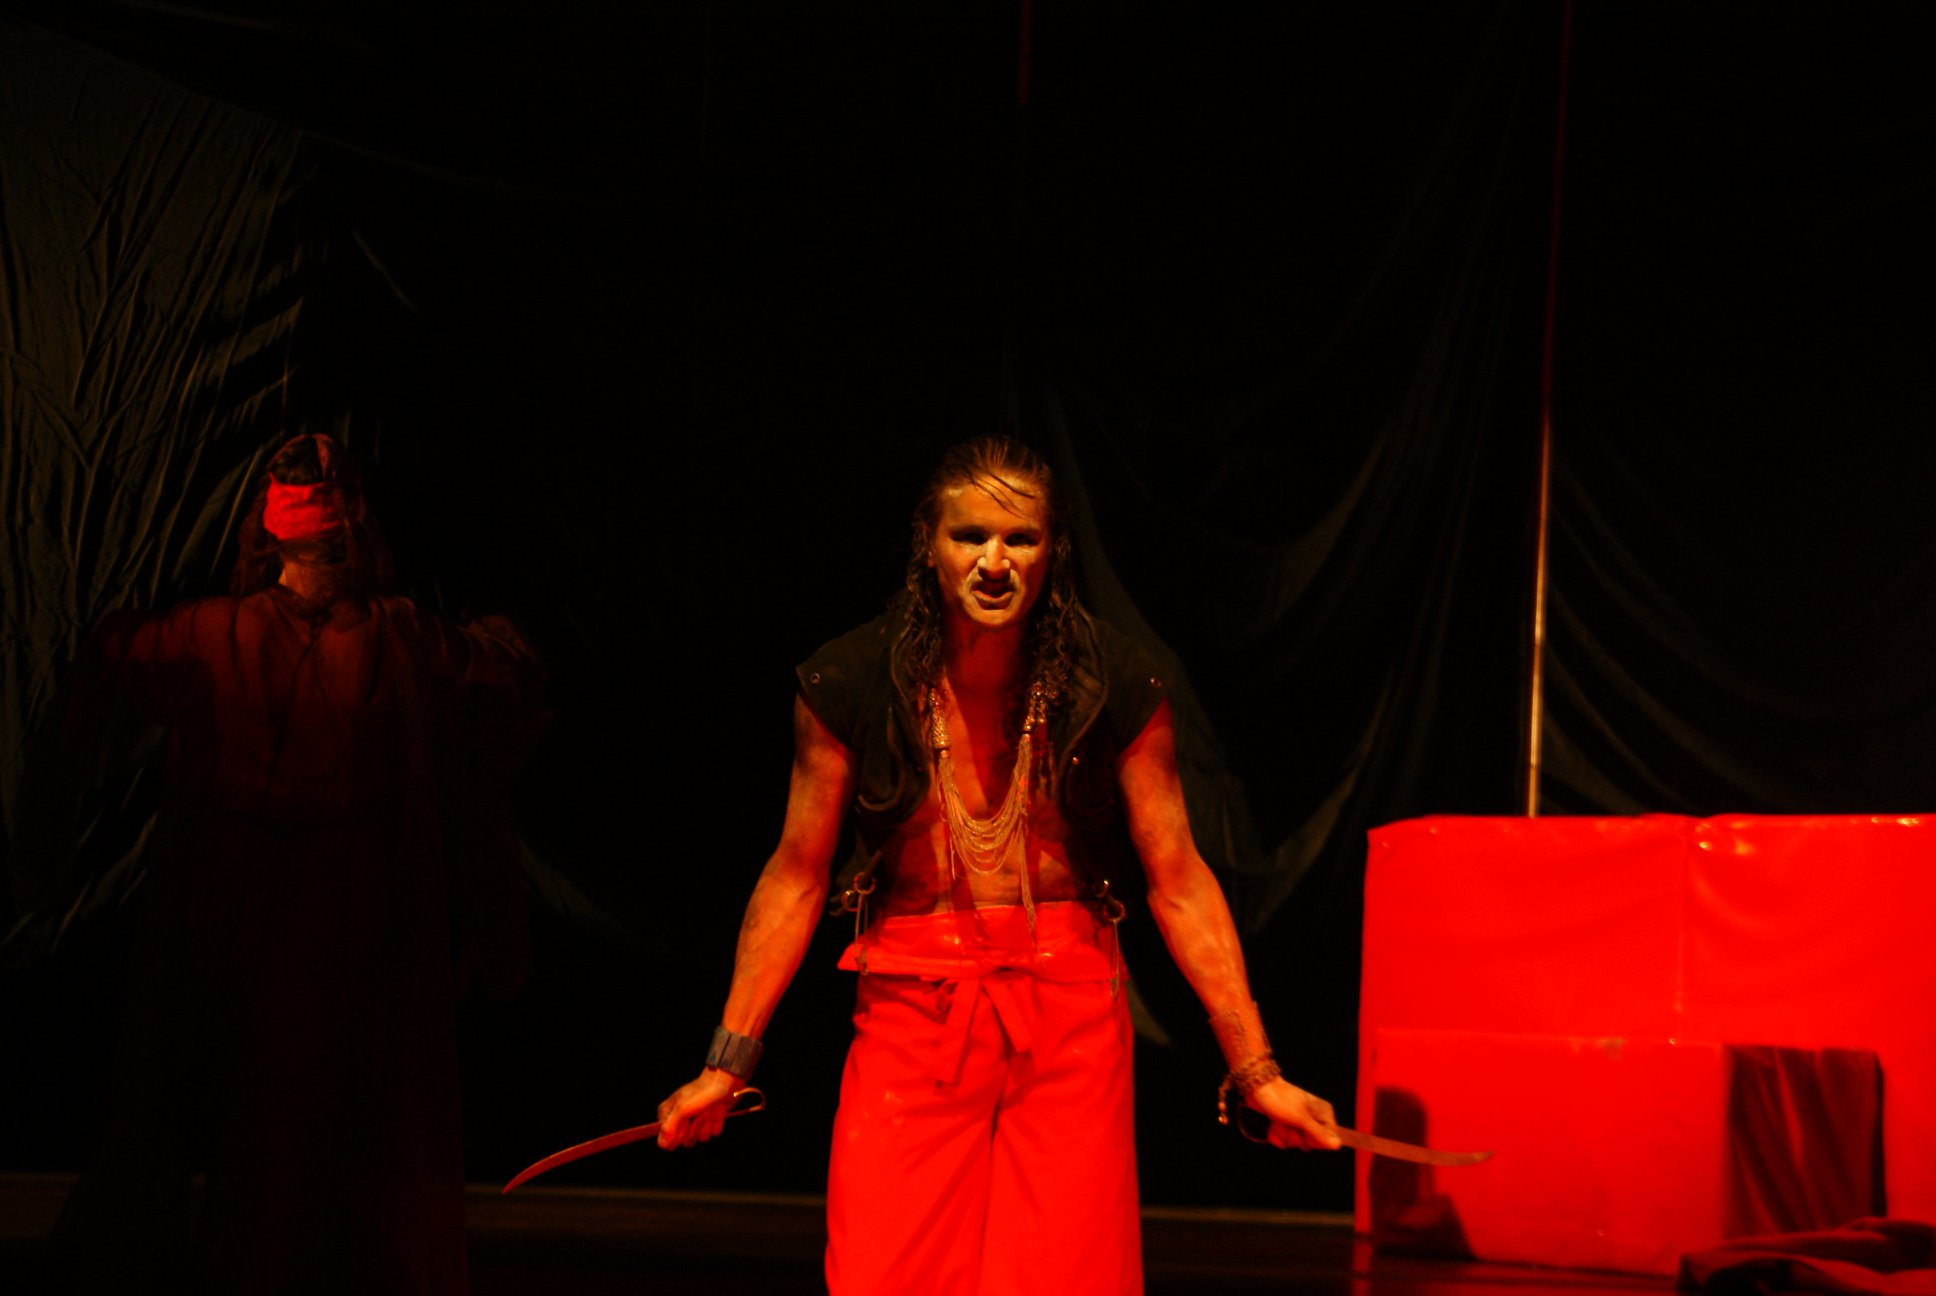 Macbeth (Shakespeare) - Rolle: Macbeth 2010